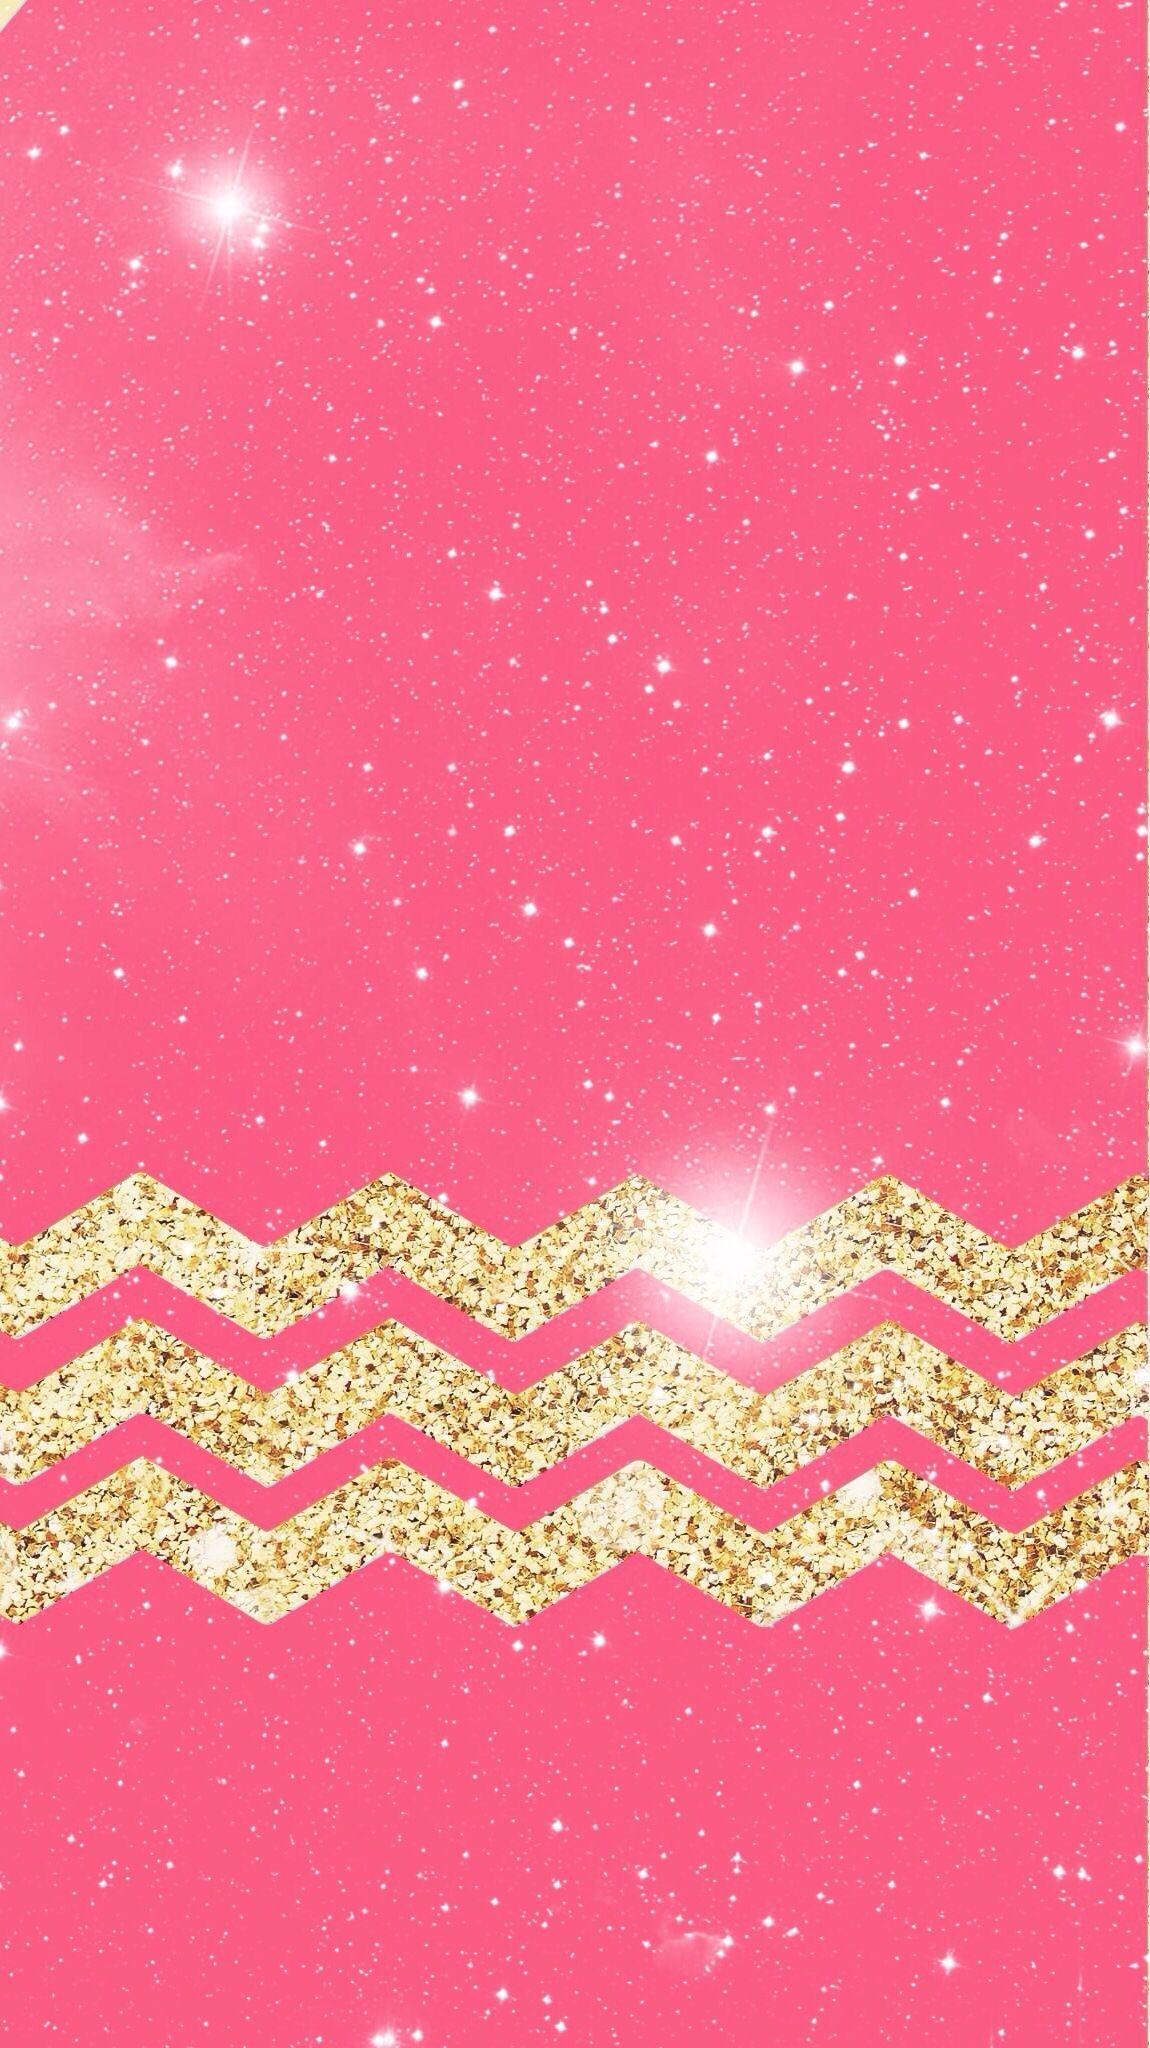 Res: 1150x2048, iPhone wallpaper http://iphonetokok-infinity.hu  http://galaxytokok-infinity.hu http://htctokok-infinity.hu